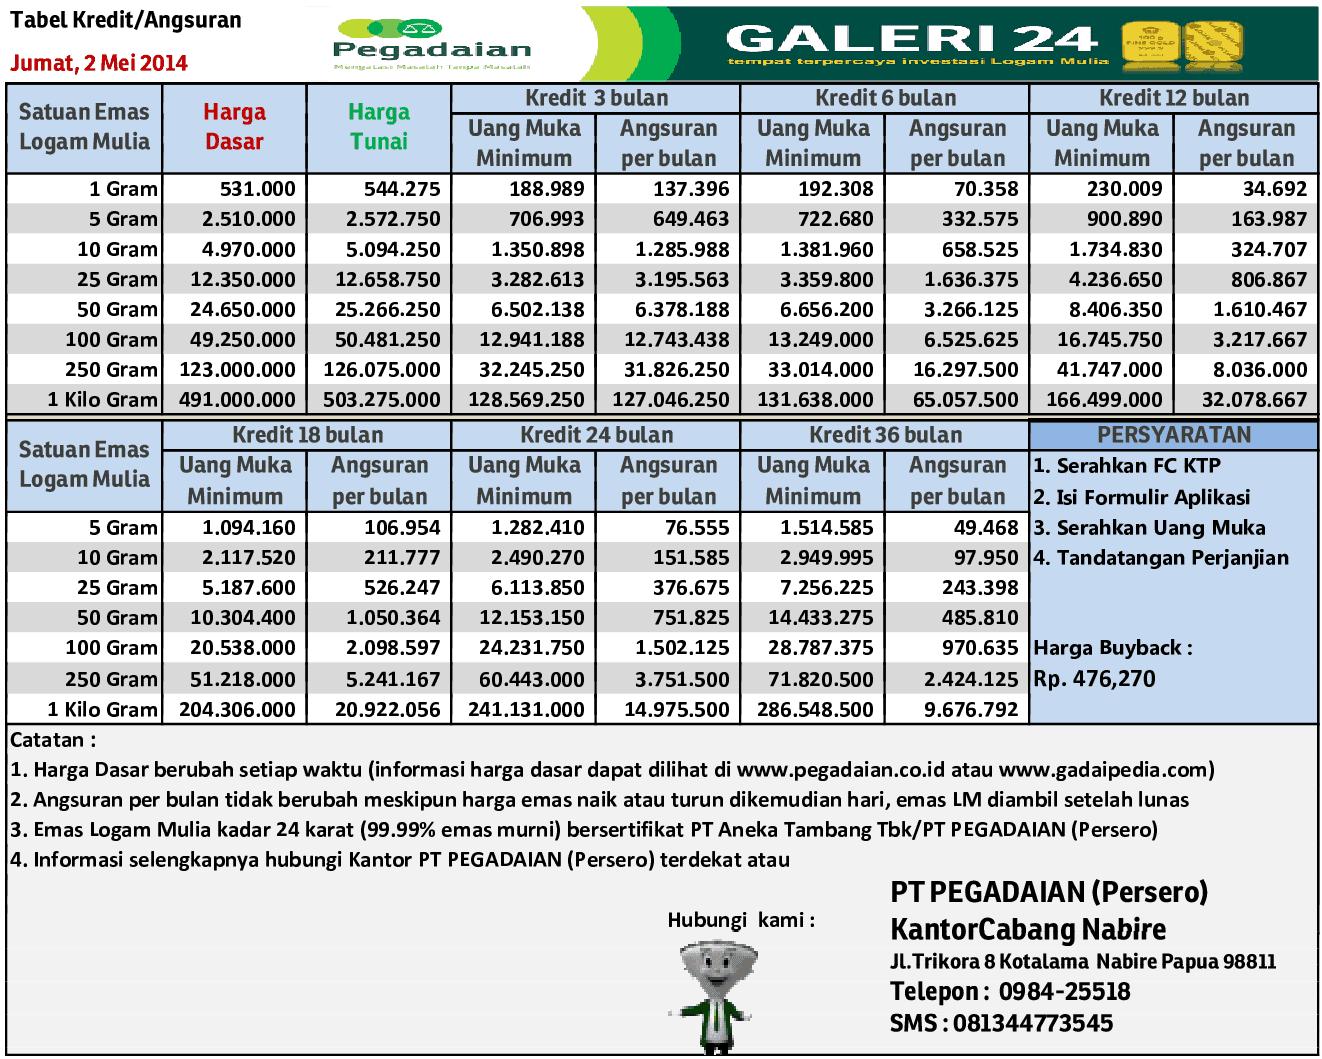 harga emas dan tabel kredit emas pegadaian 2 mei 2014